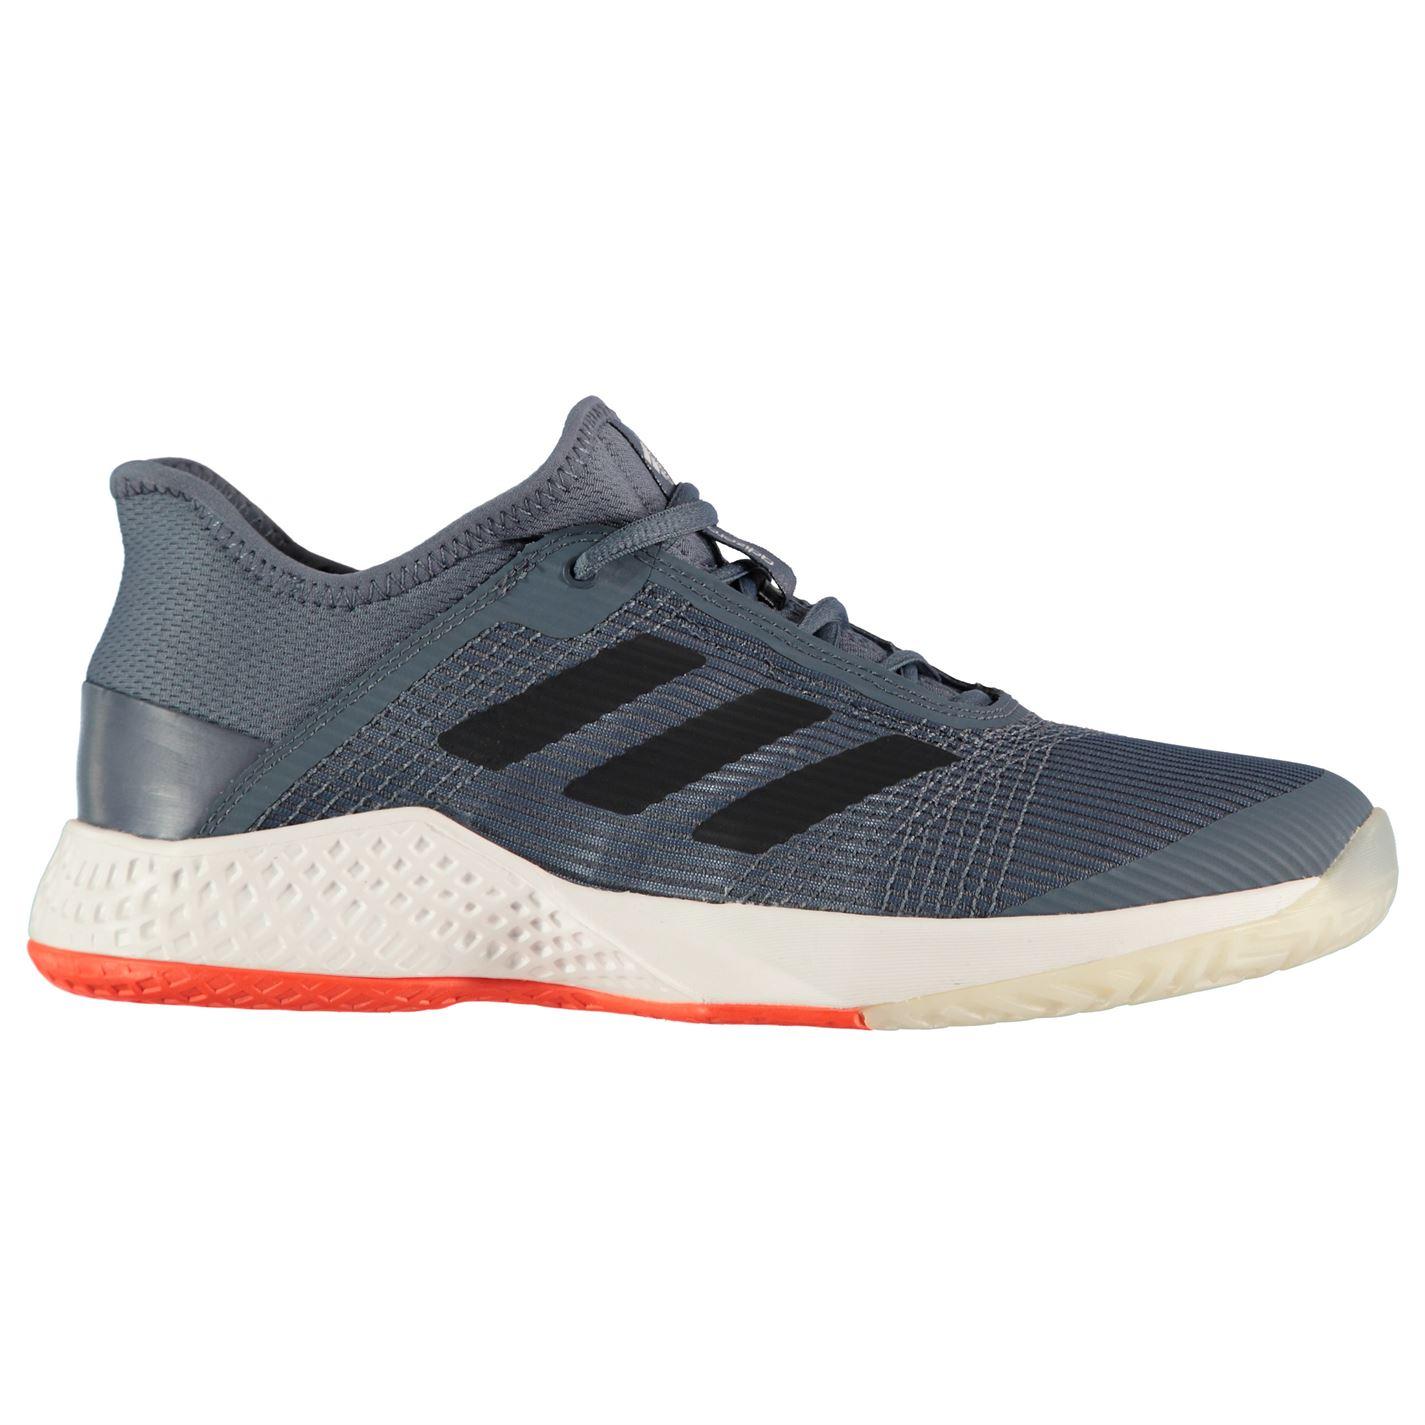 Adidas Adizero Club Trainers Mens